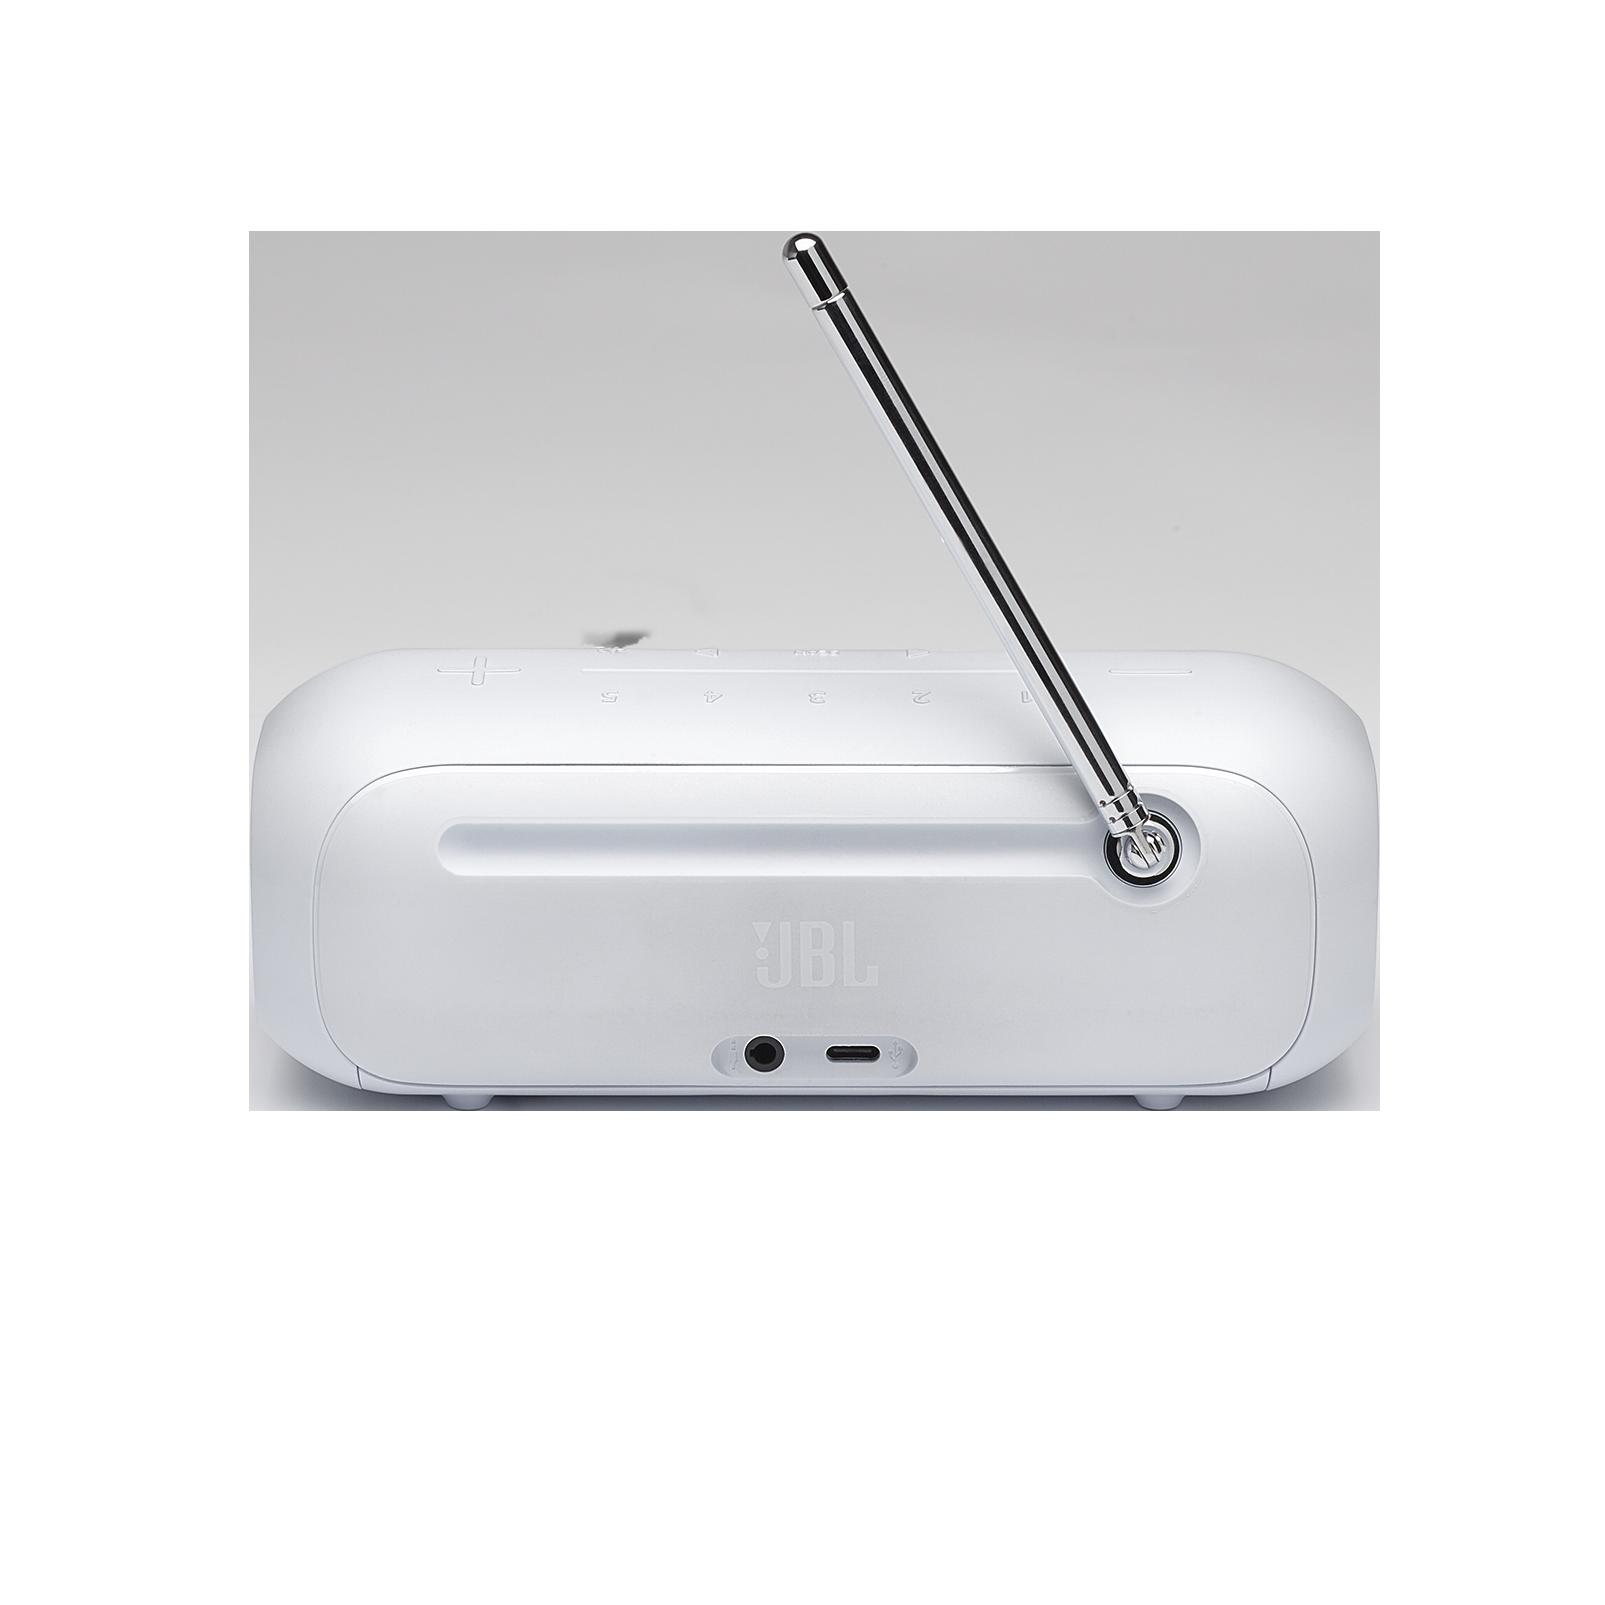 JBL Tuner 2 - White - Portable DAB/DAB+/FM radio with Bluetooth - Back